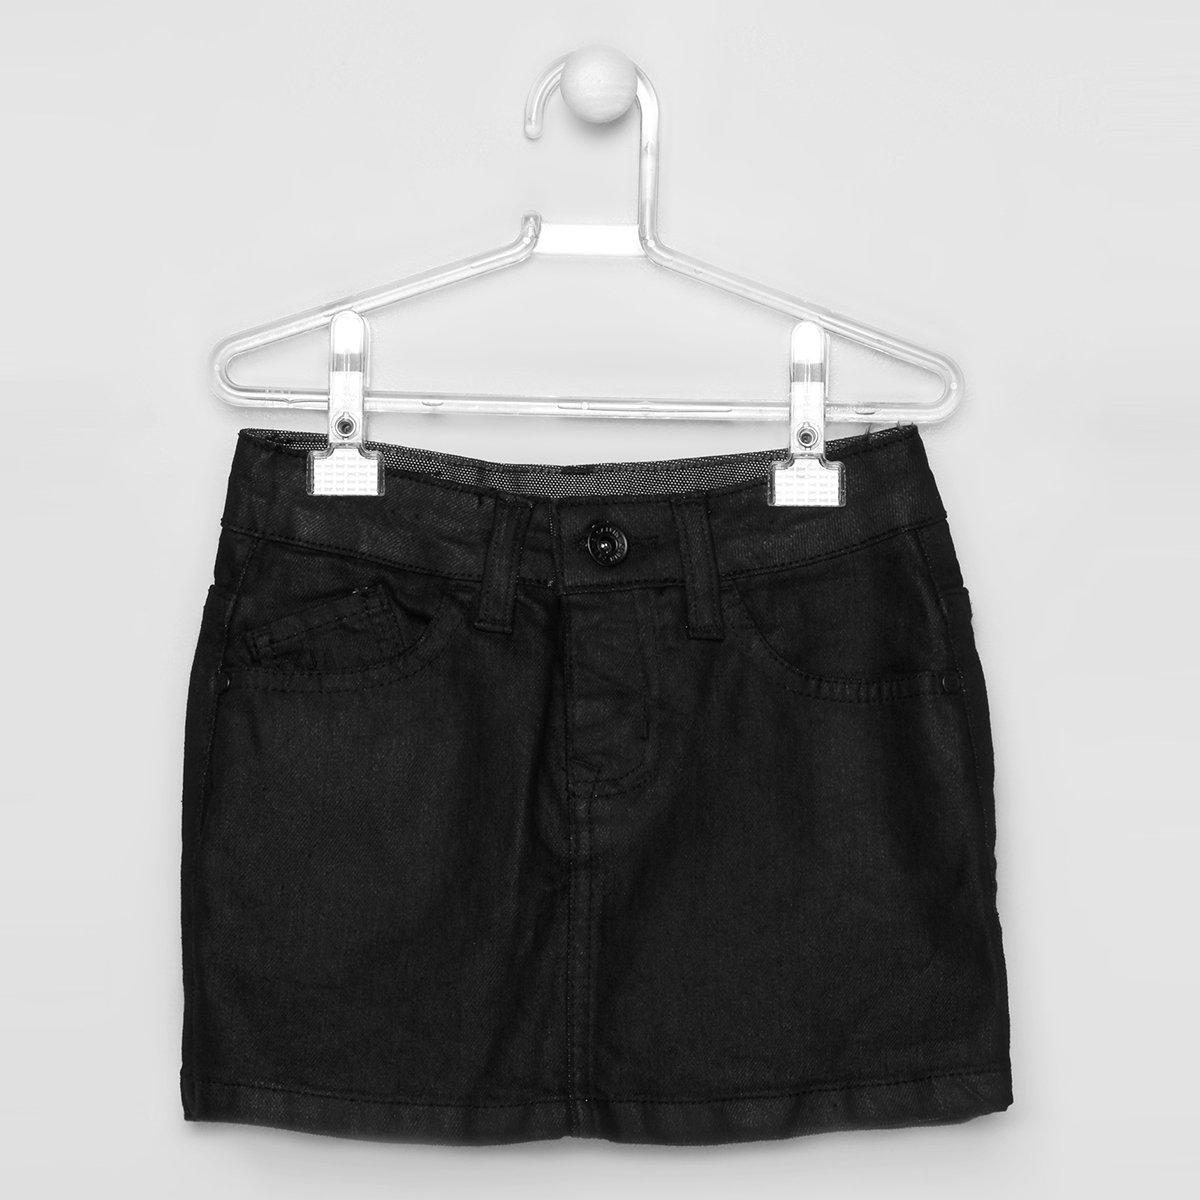 Saia Calvin Klein Juvenil - Compre Agora   Netshoes 2f71c2d09c